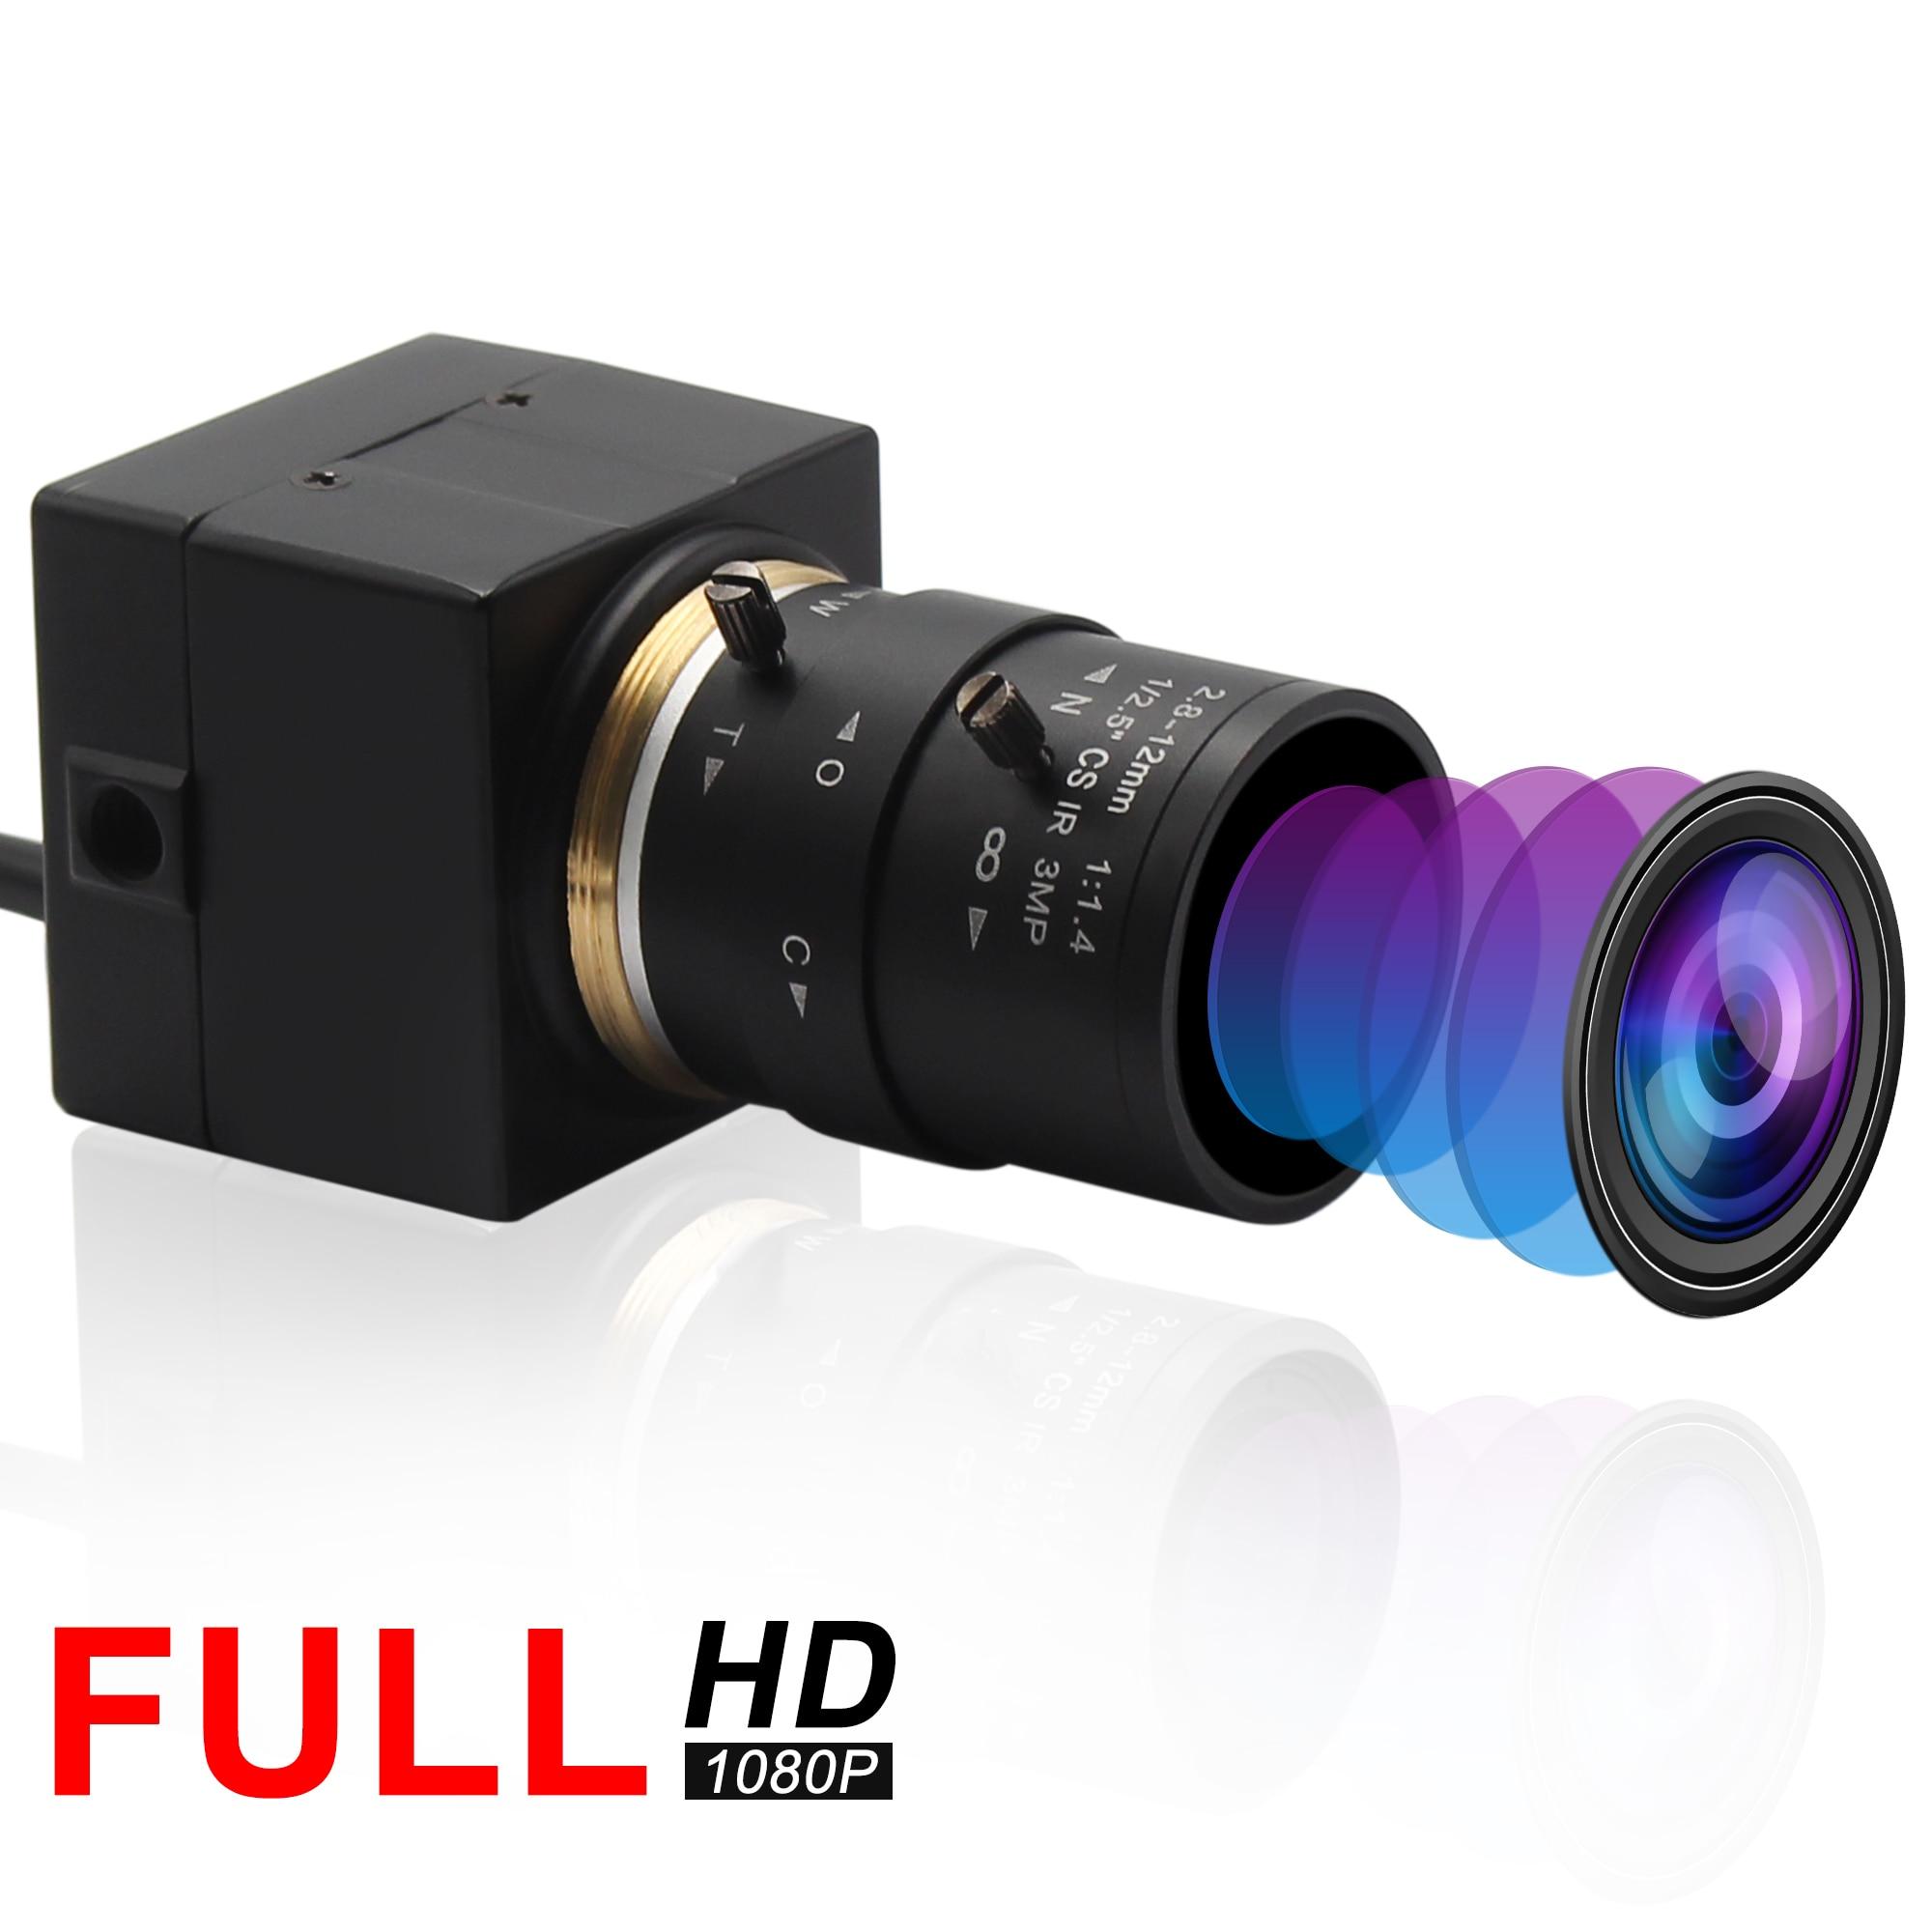 Volle HD 1080P USB Webcam 2,8-12mm Varifocus CS objektiv CMOS OV2710 MJPEG 30fps/60fps/ 120fps USB Kamera für Computer PC Laptops